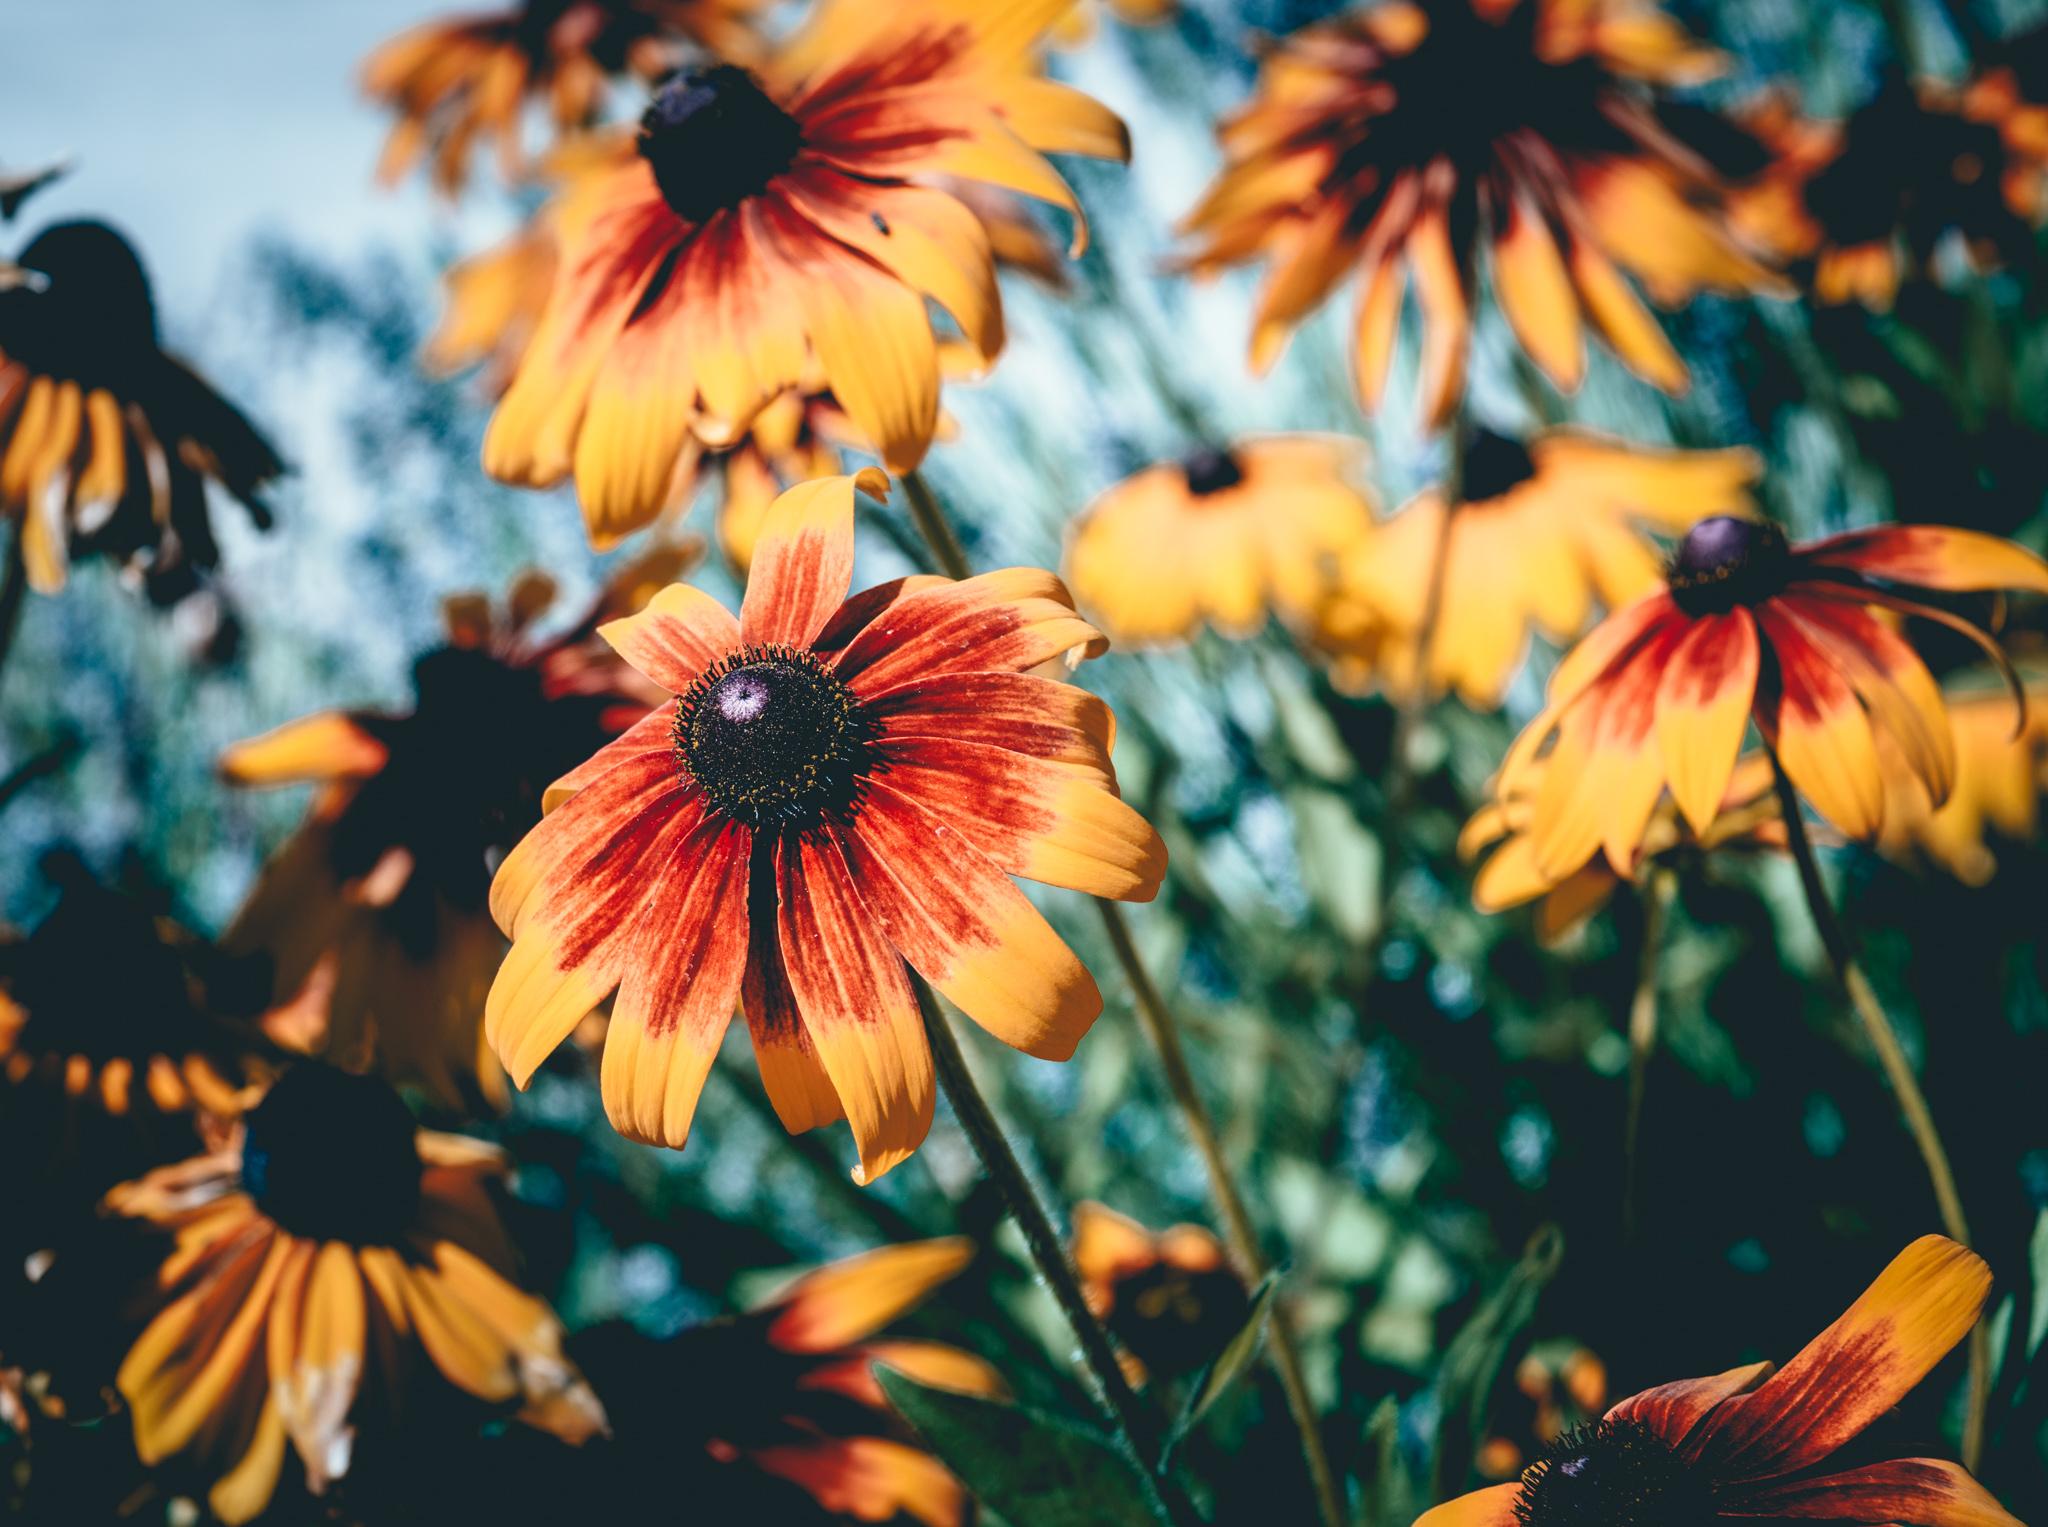 US : Oregon : Penner-Ash's garden